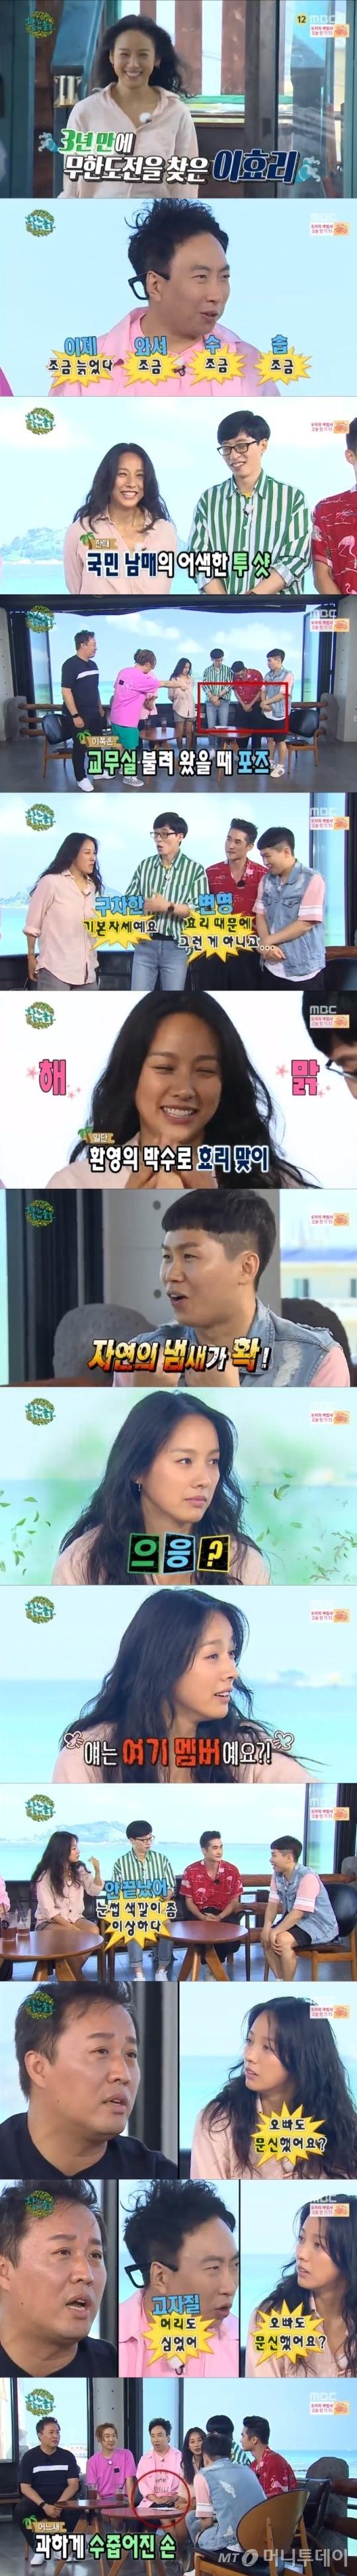 MBC '무한도전' 방송 캡처.